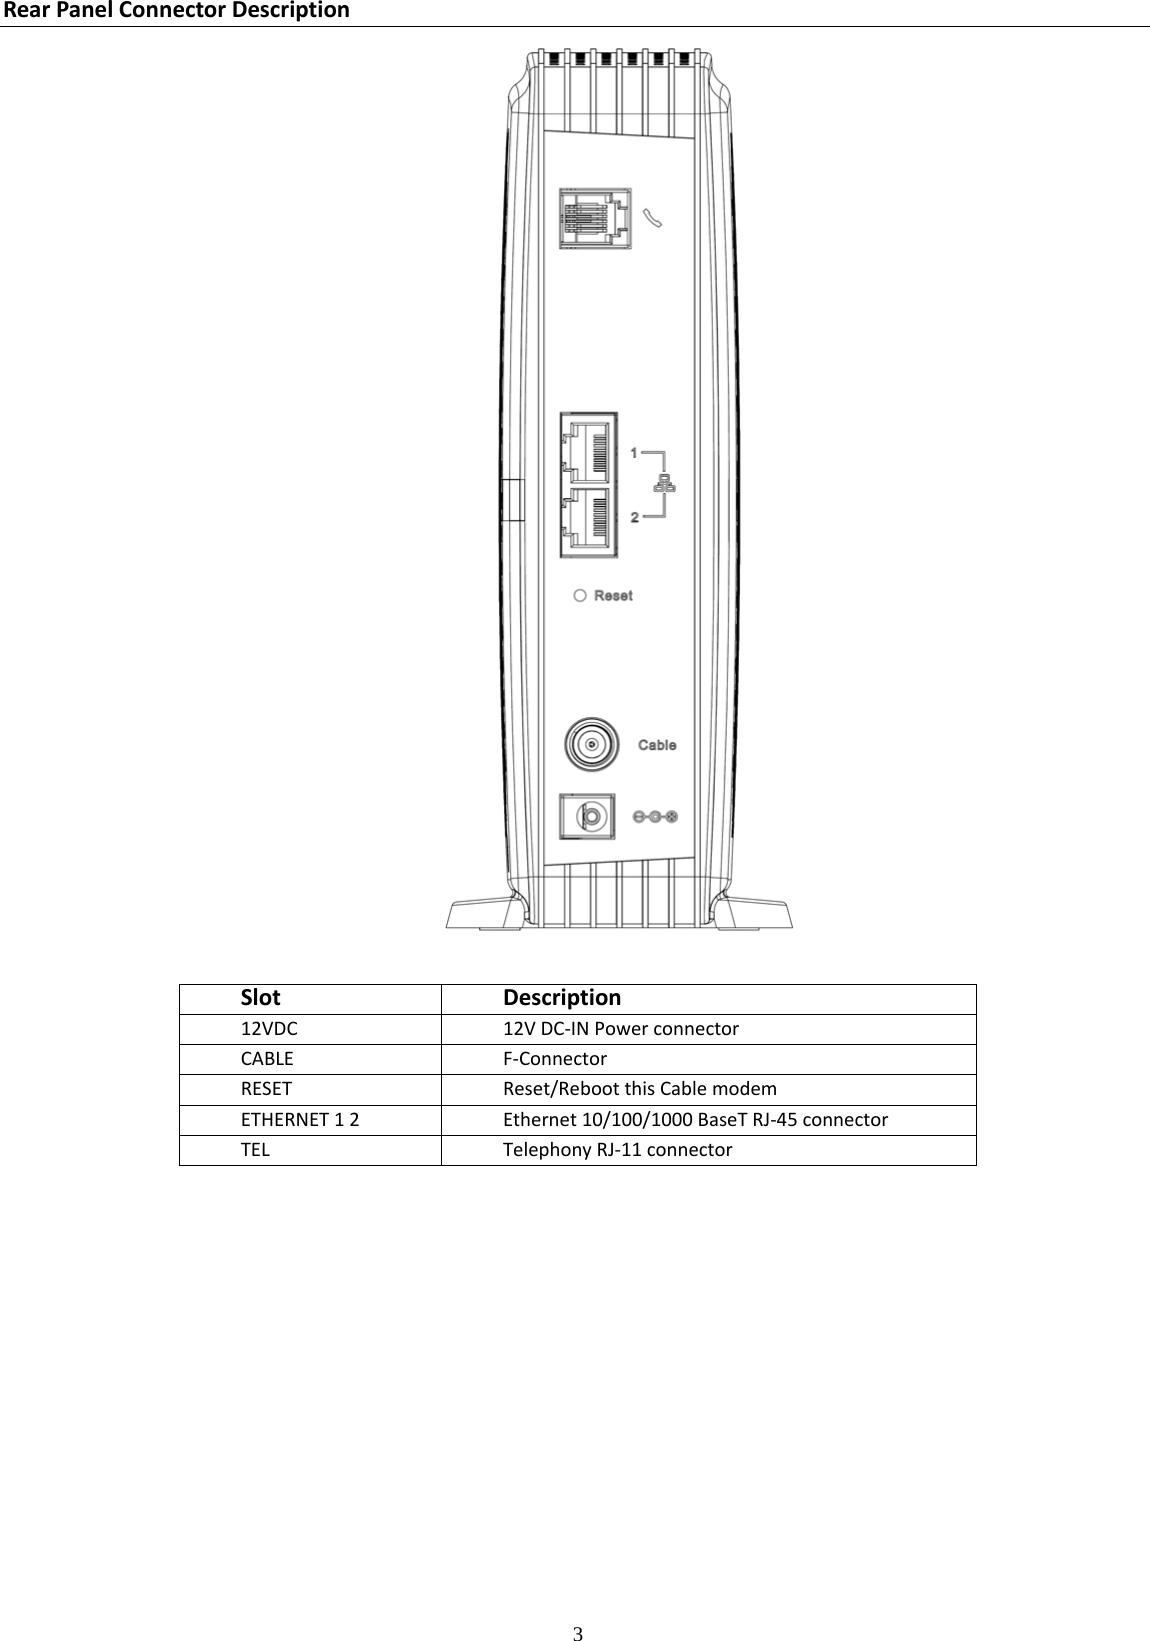 Askey Computer TCG220 Cable Modem User Manual rev